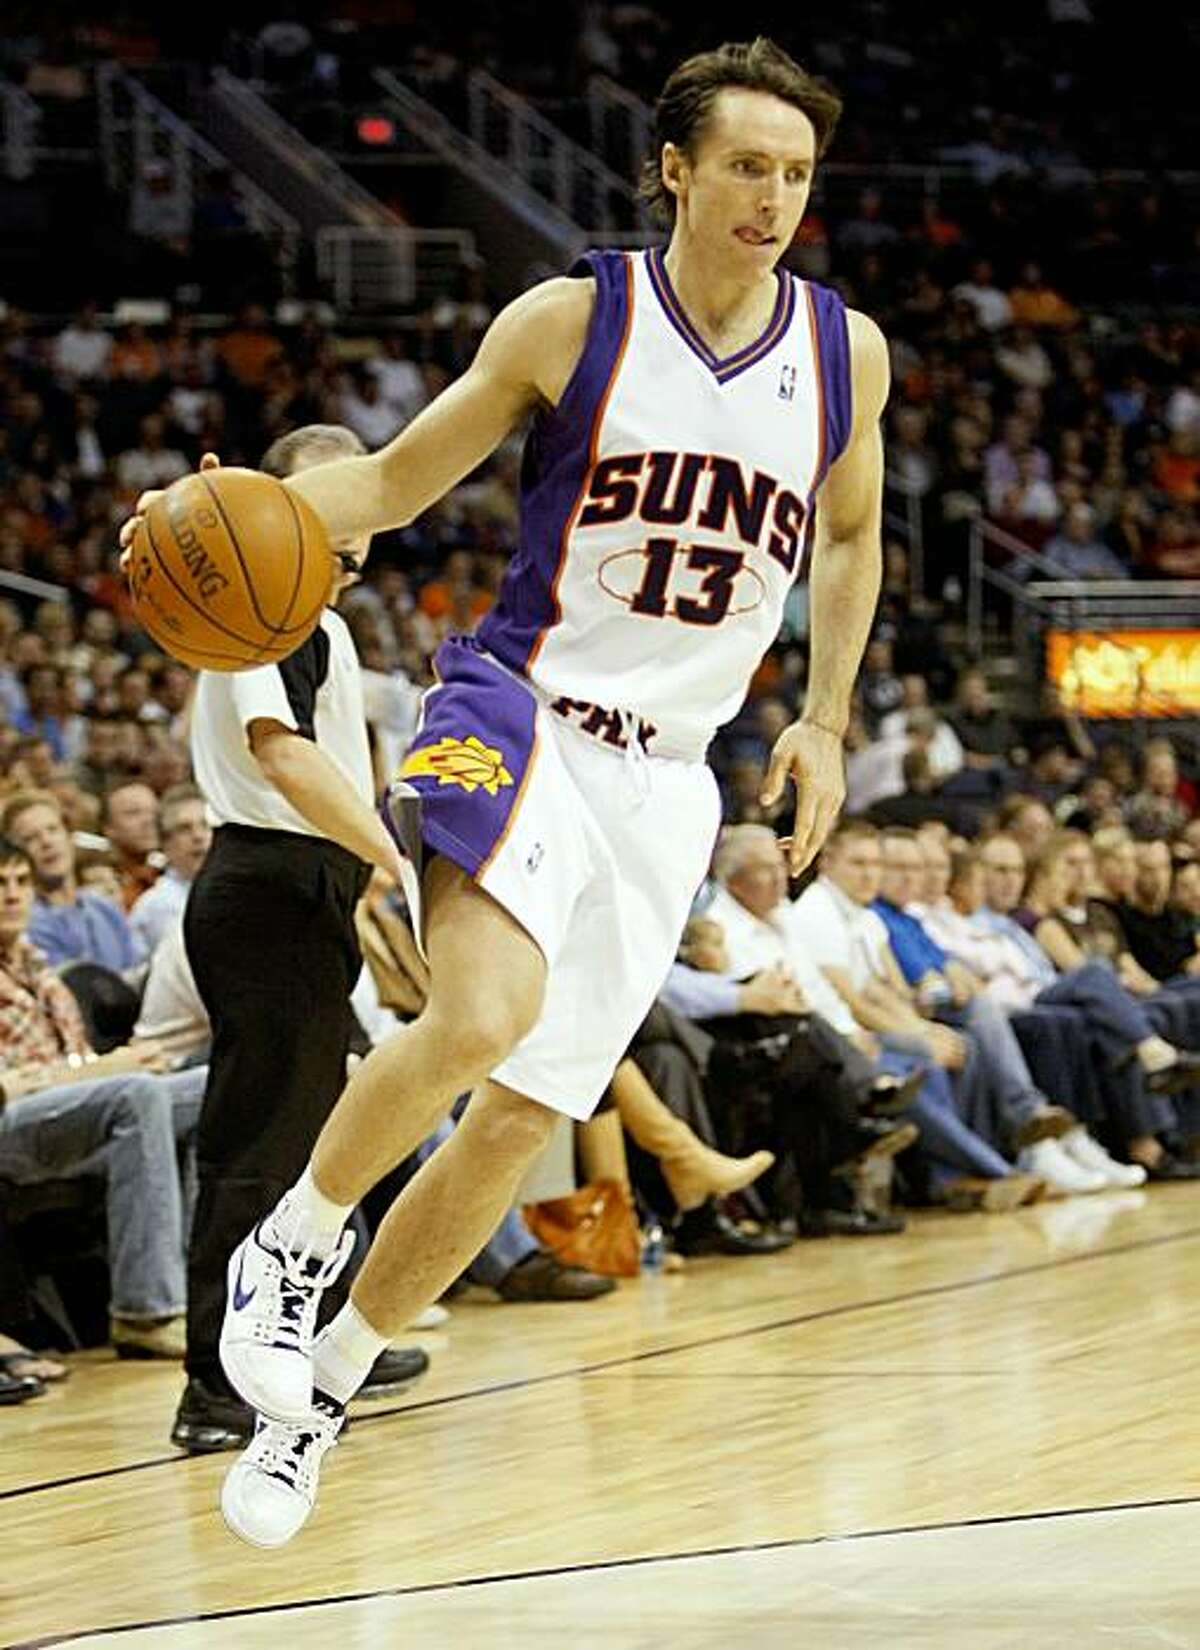 Phoenix Suns' Steve Nash drives the baseline against the Memphis Grizzlies during the fourth quarter of an NBA basketball game Wednesday, Nov. 25, 2009, in Phoenix. (AP Photo/Matt York)